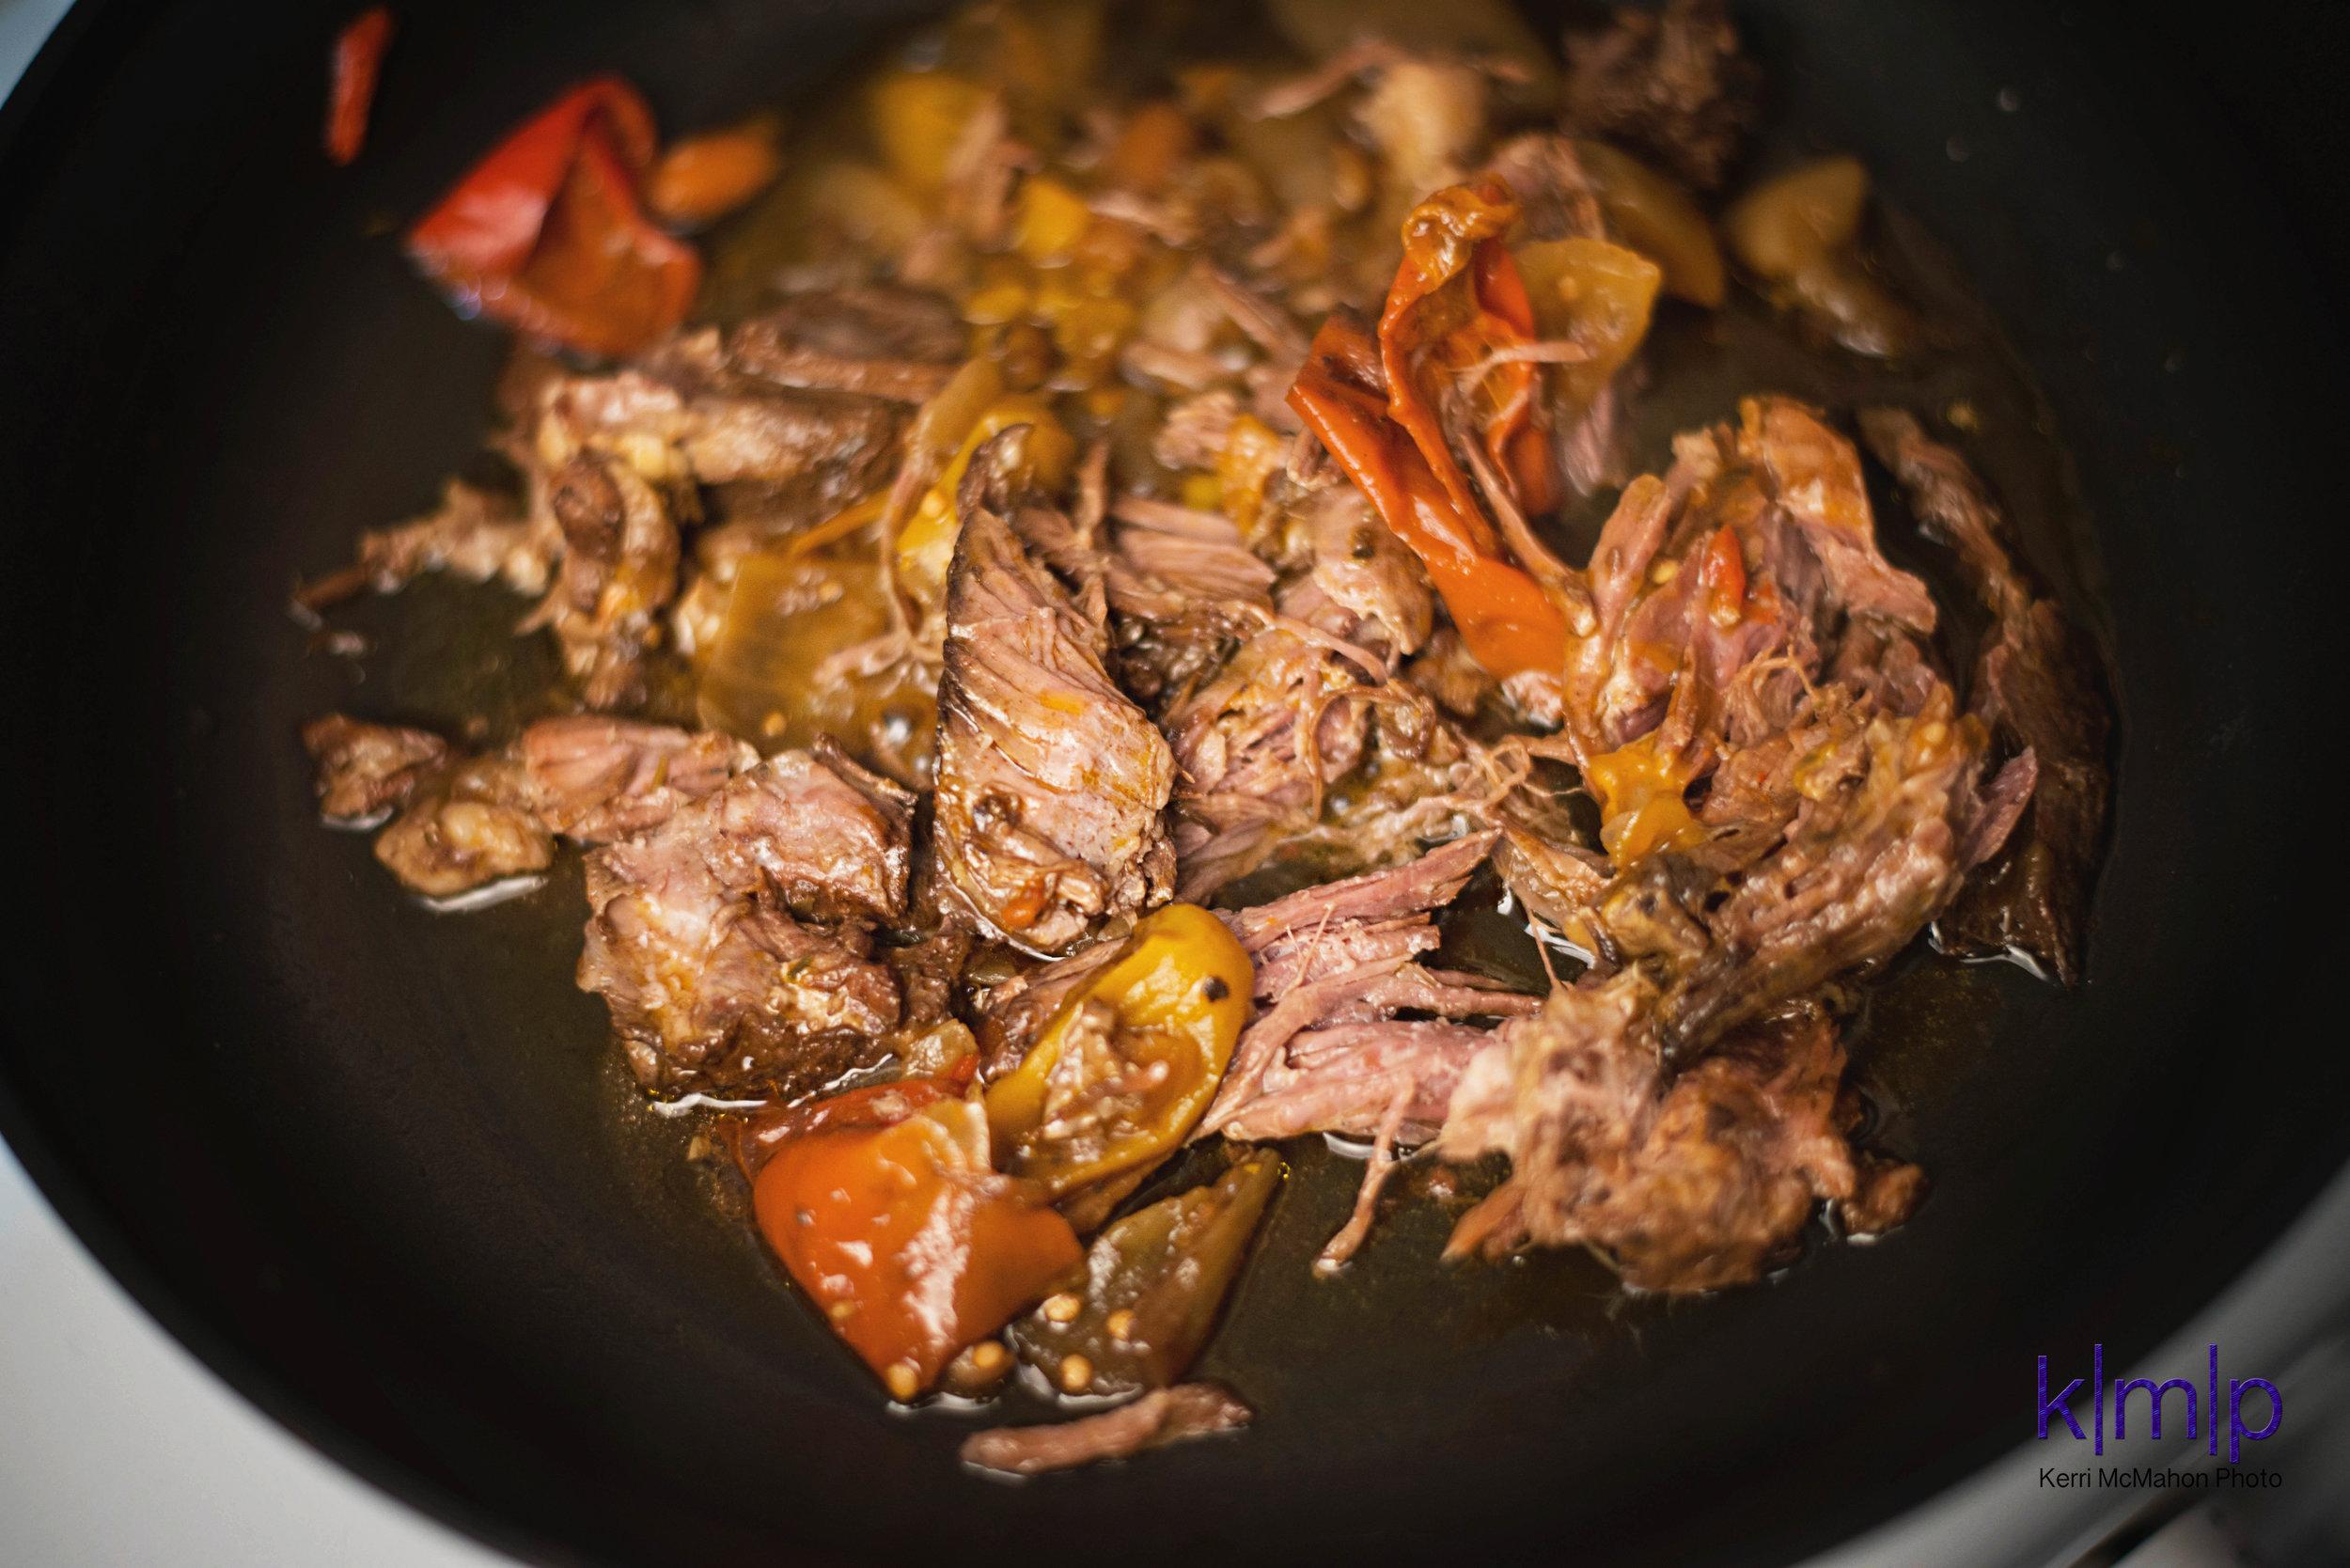 Cook the roast until the edges are crisp.